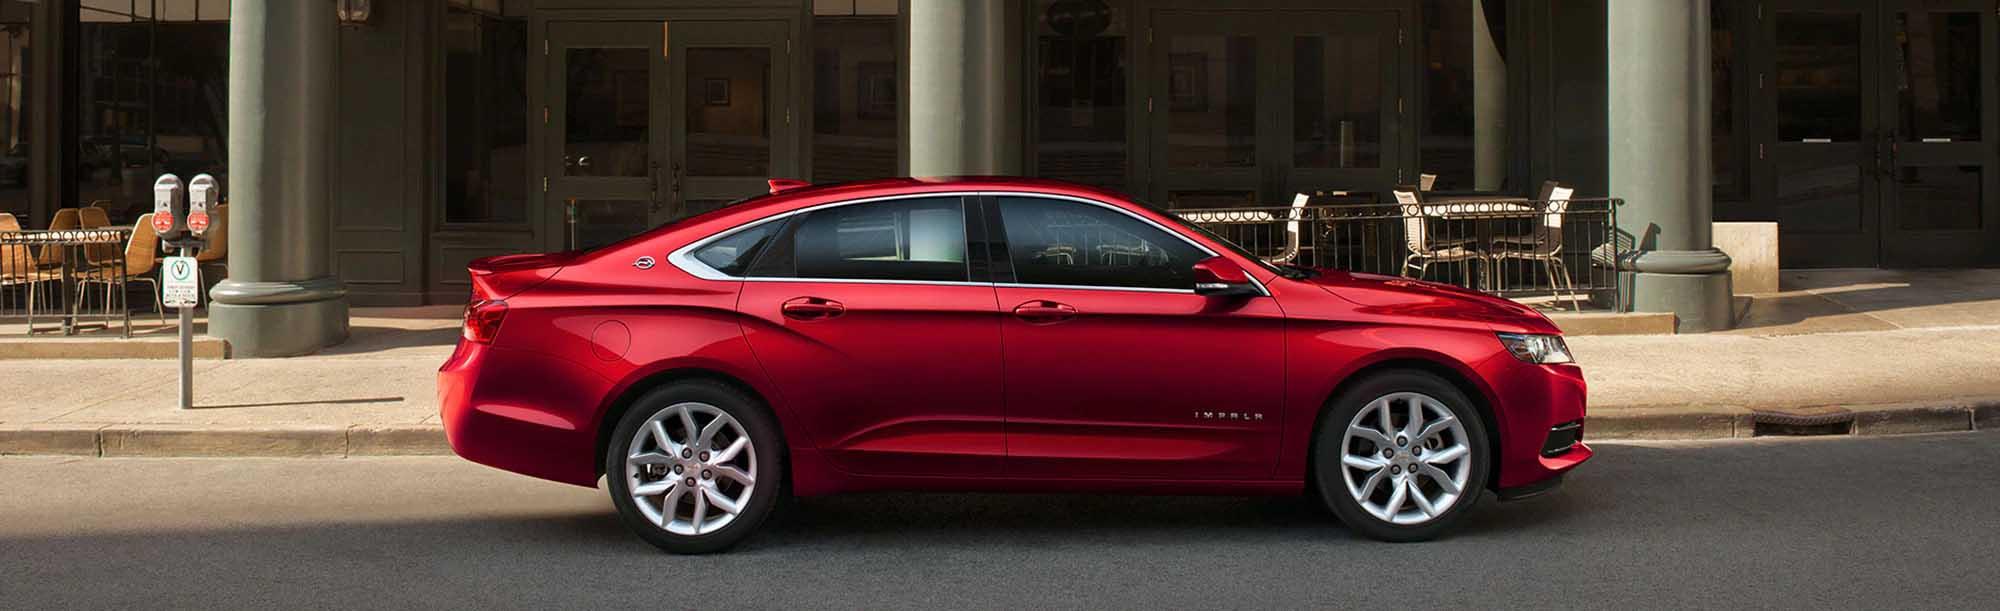 Explore The Features Of The New 2020 Chevrolet Impala Near Atlanta